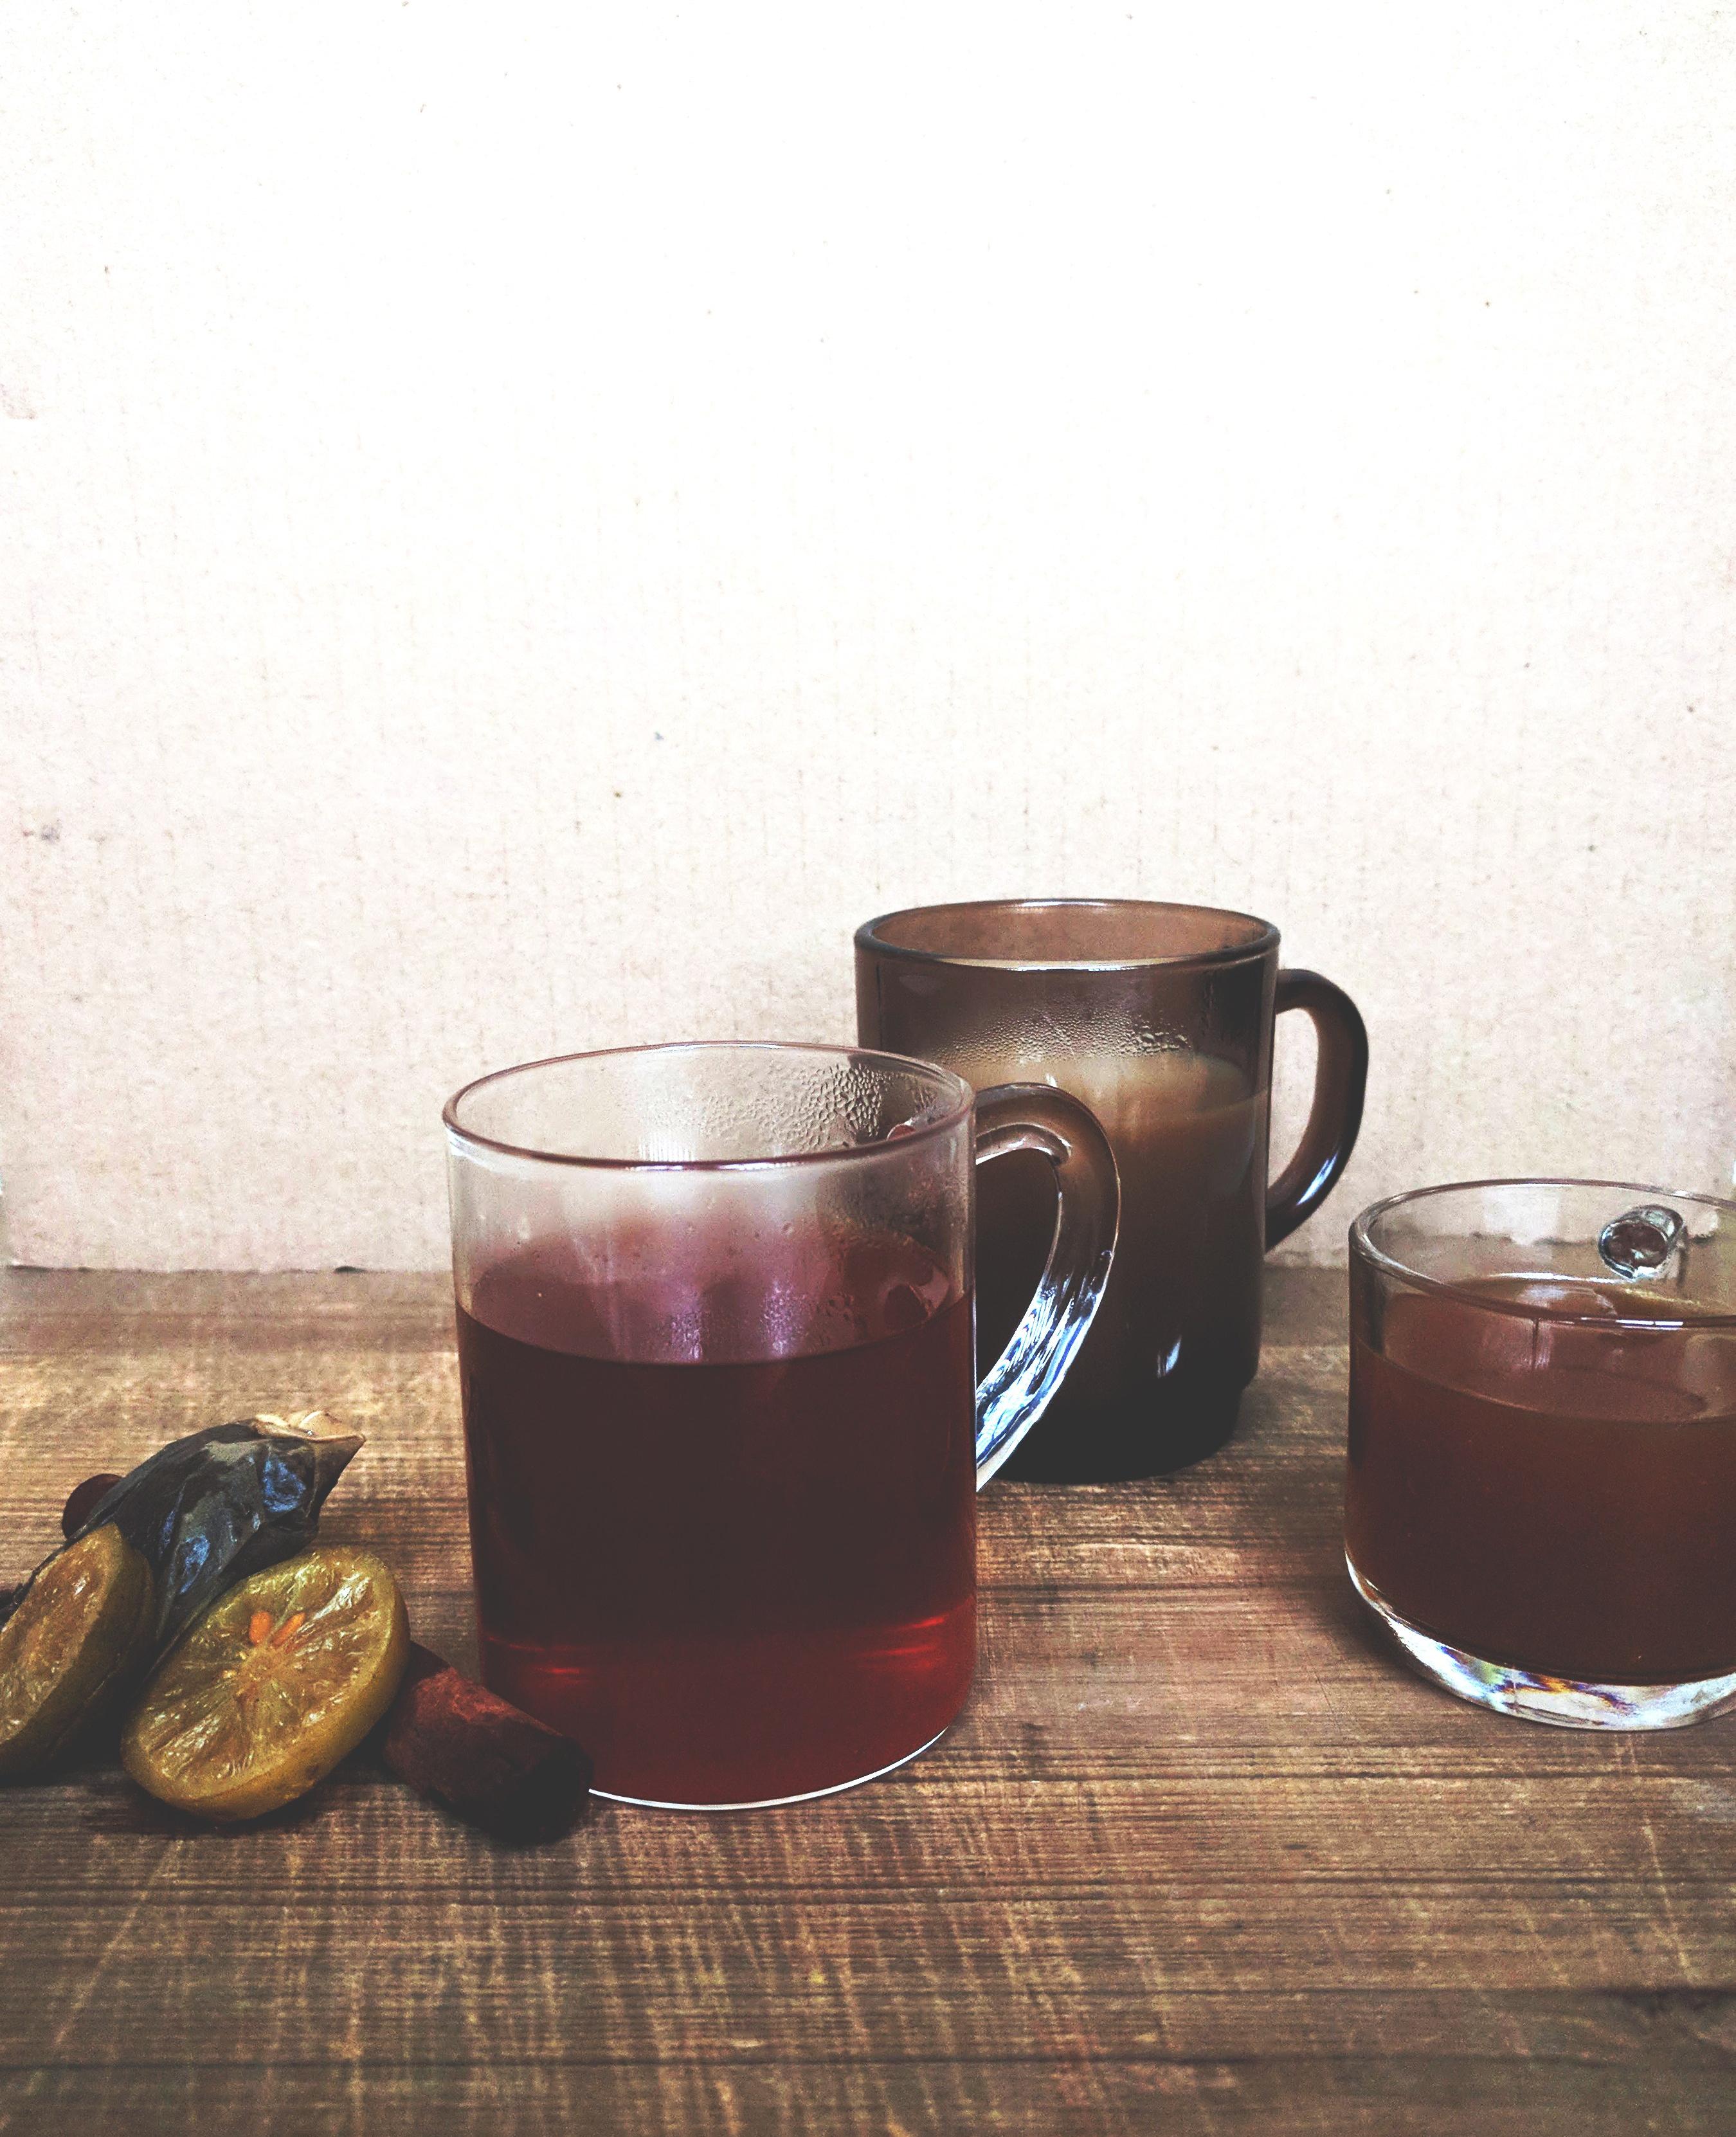 IMG_20171120_173316_Vaibhav.jpg from the corner table, fromthecornertable, photo:Vaibhav Tanna, tea, travel tuck-in talk, tea time, tea recipes, marmalade tea, pineapple tea, spiced green tea